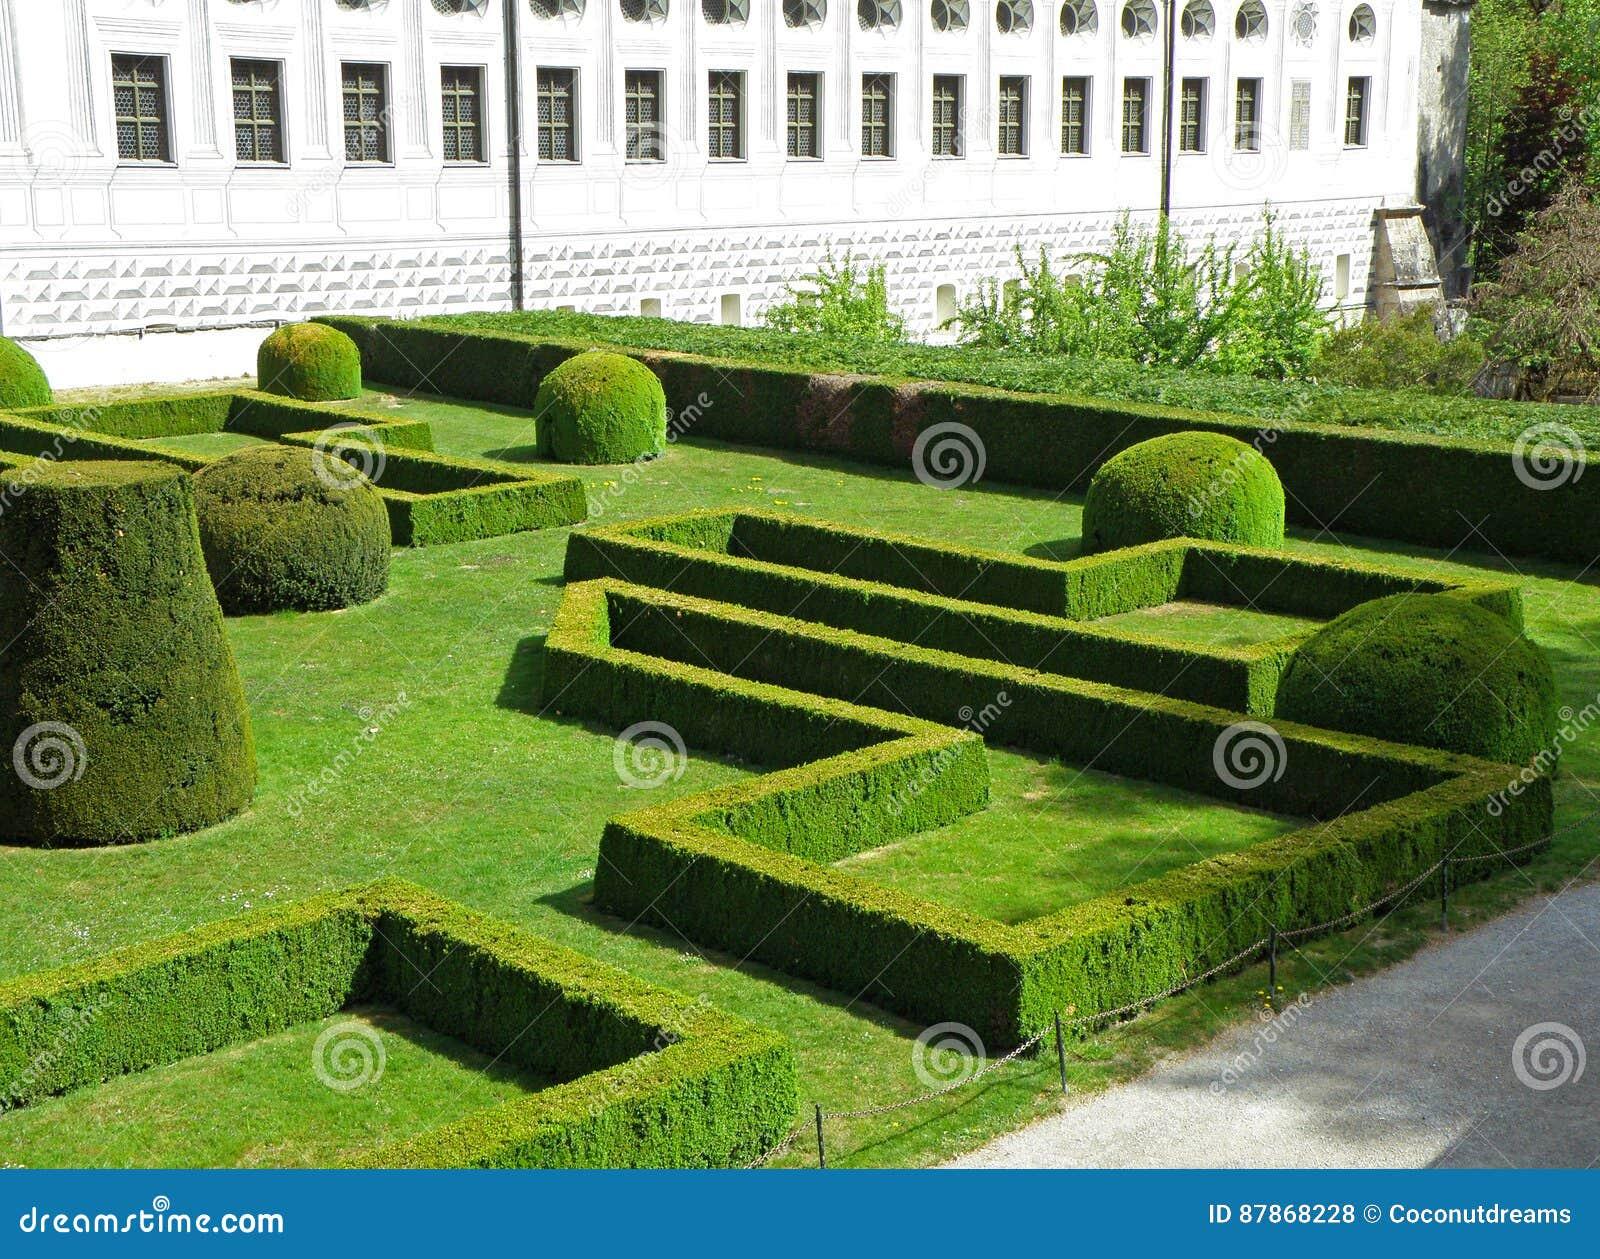 Schöner englischer Garten des Ambras-Schlosses, Innsbruck